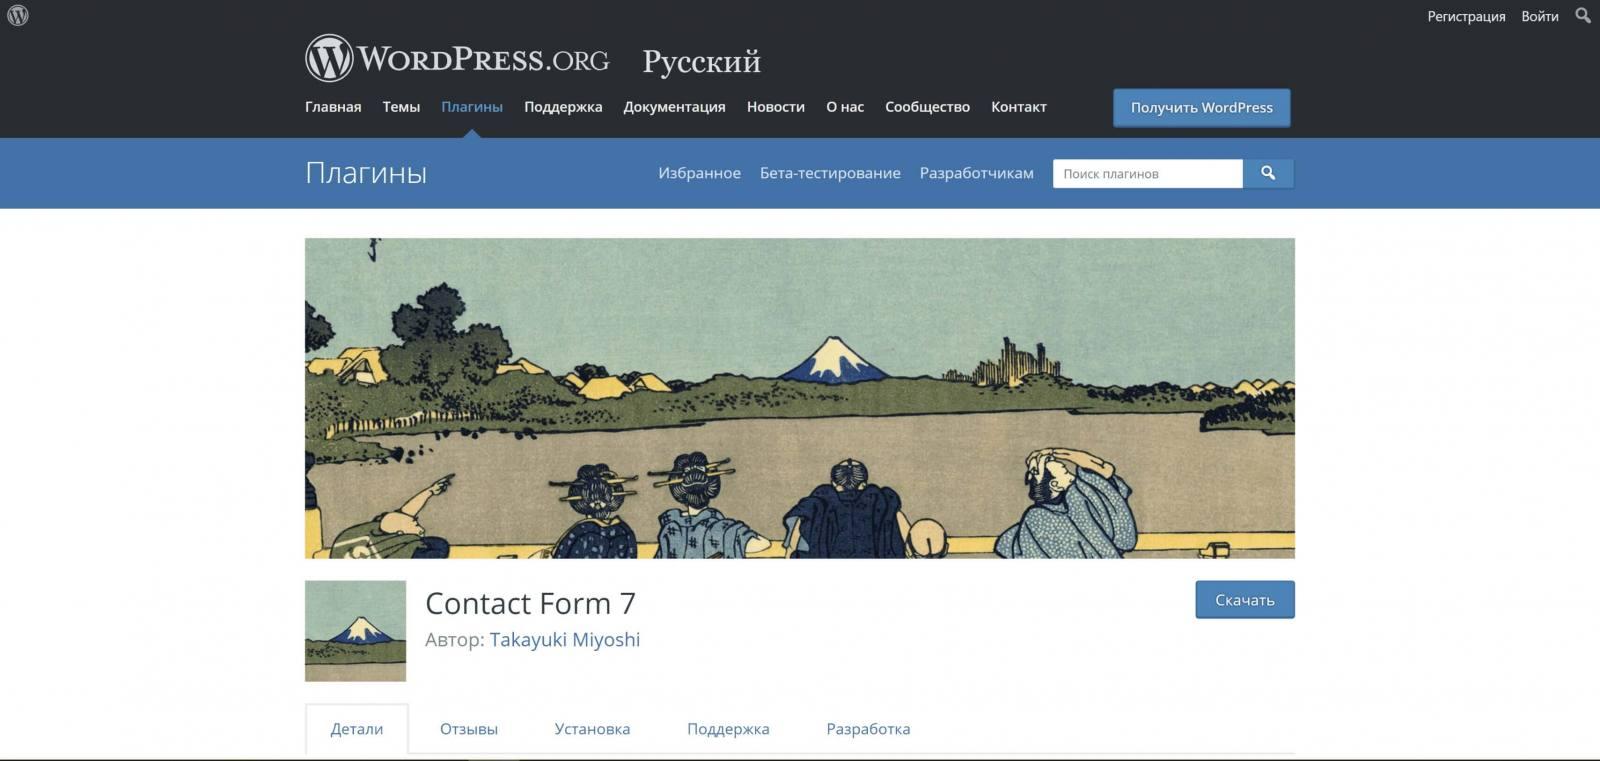 contact-form7-blog